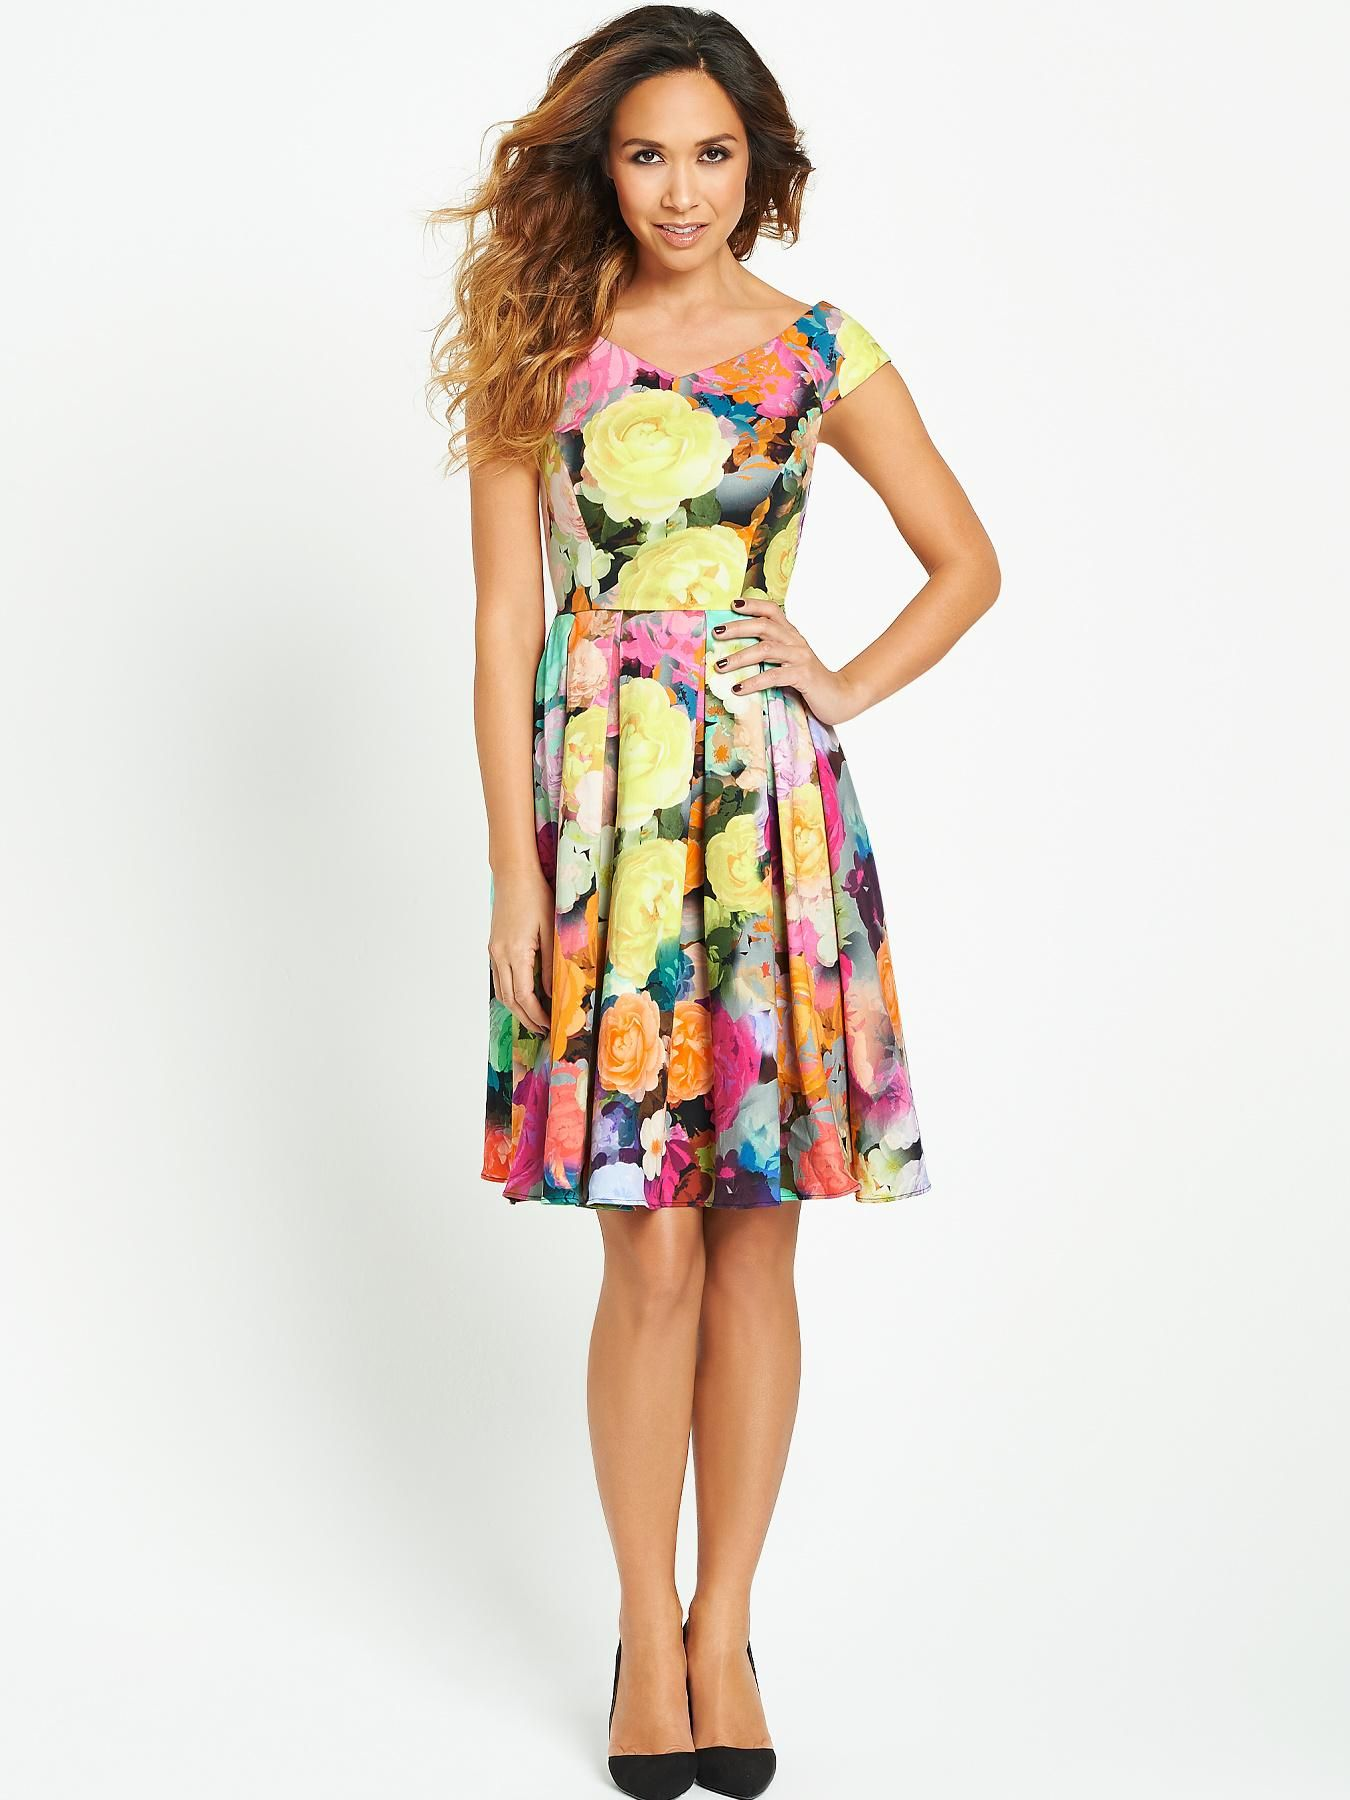 Klass clothing online